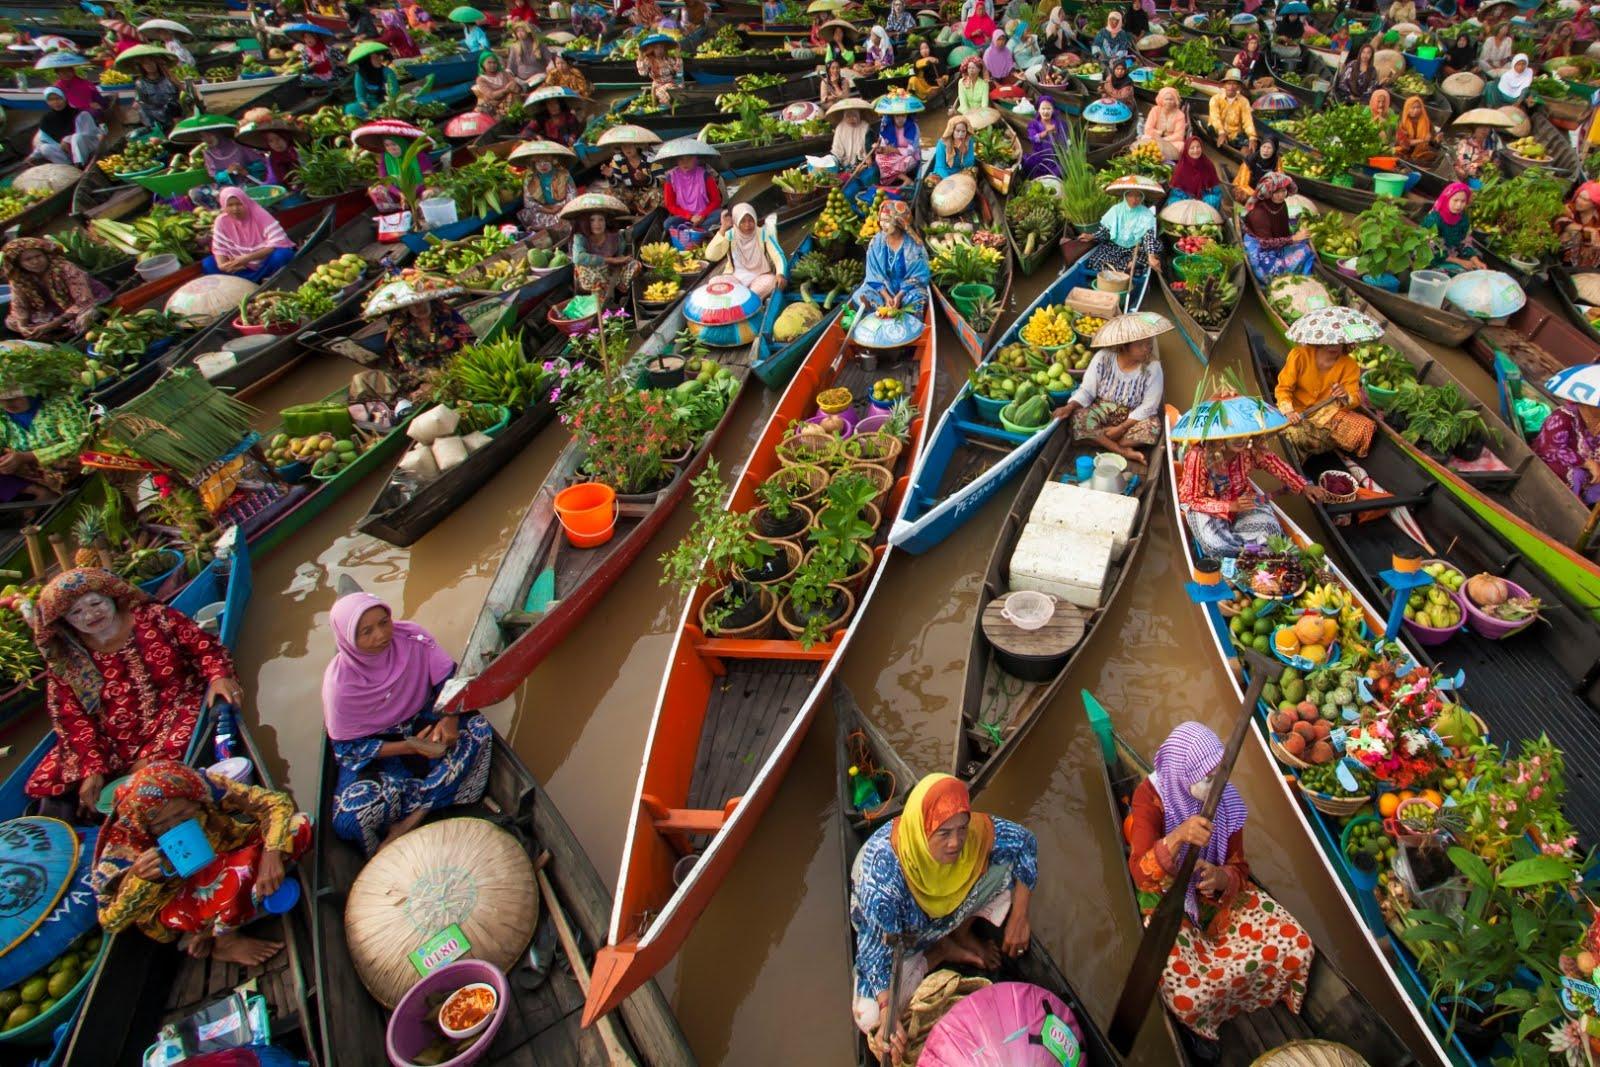 35 Tempat Wisata Banjarmasin Seputar Pasar Terapung Lok Baintan Muara